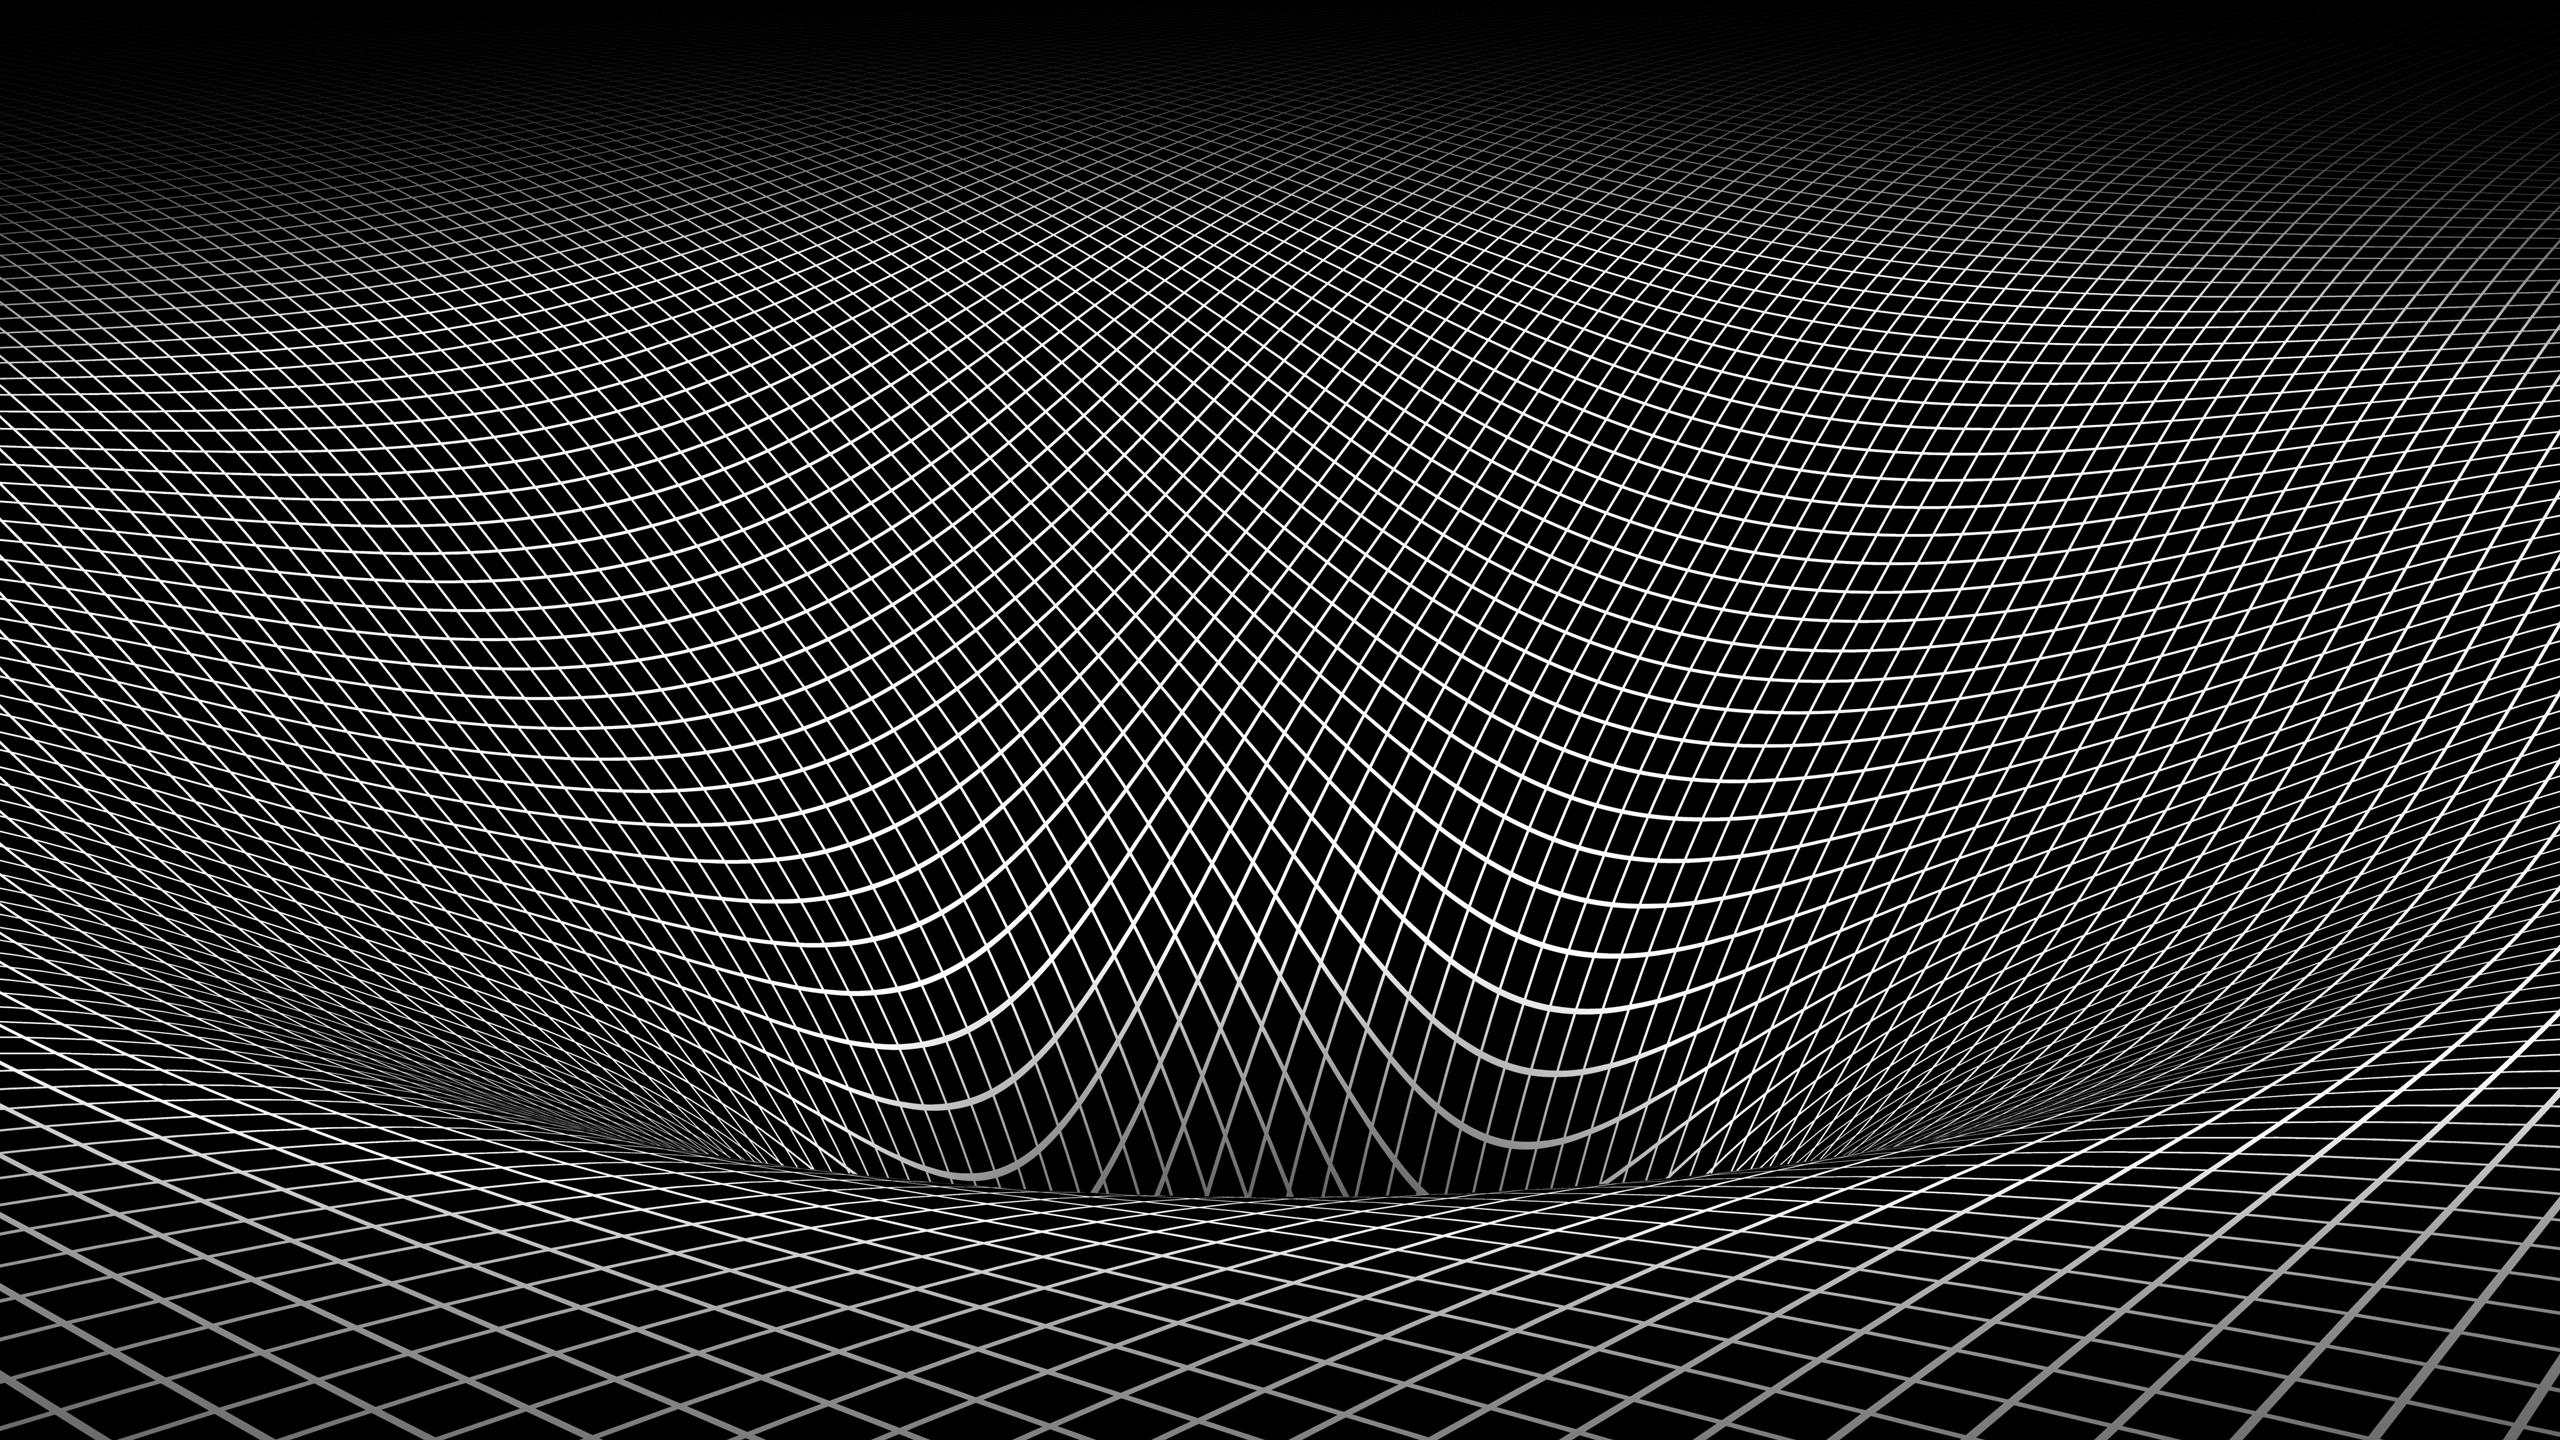 wormhole_wallpaper_2560x1440